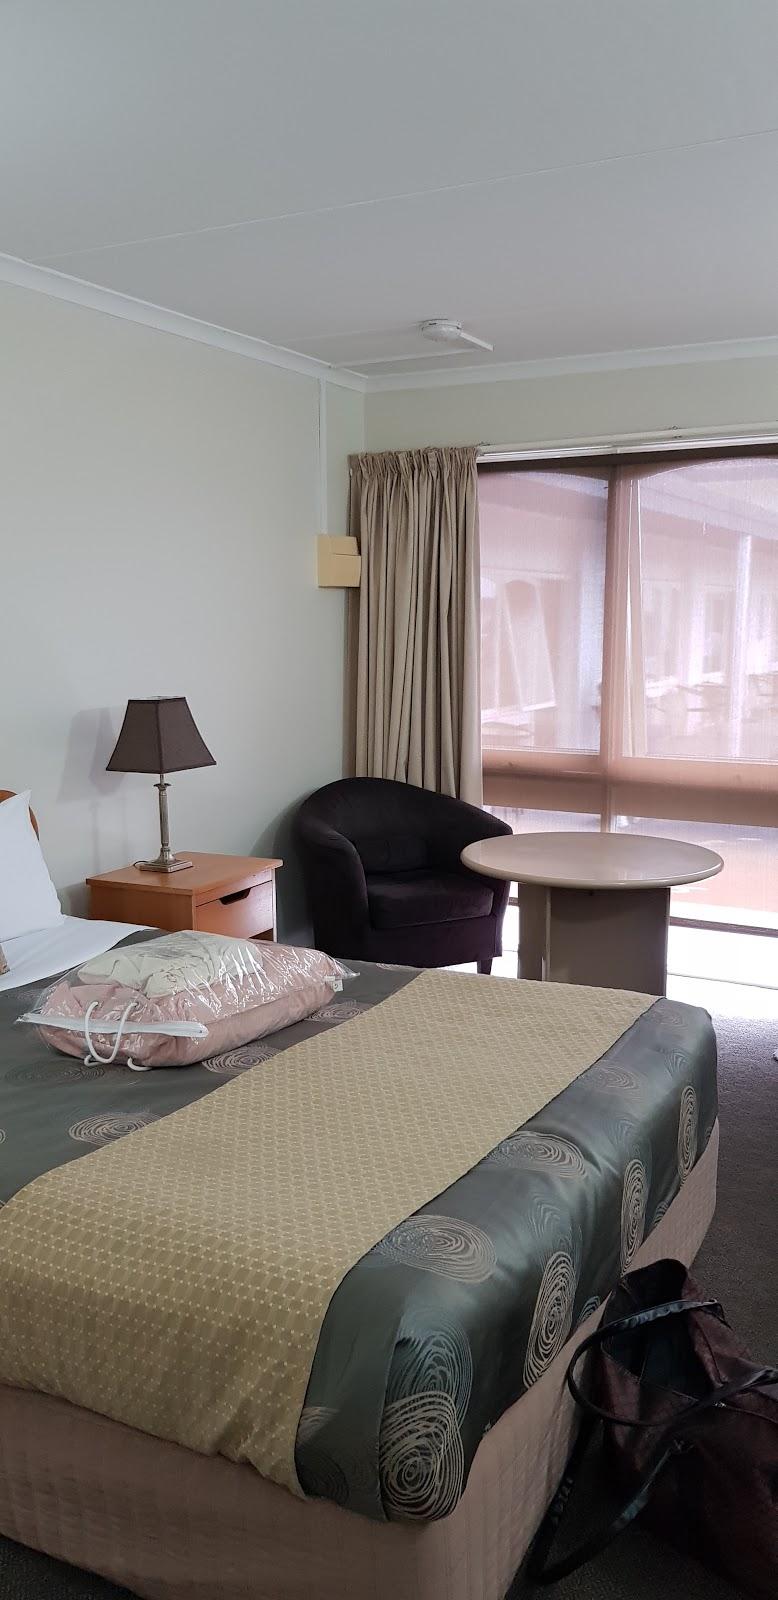 Hacienda Motel Geelong | lodging | 15 Mt Pleasant Rd, Geelong VIC 3216, Australia | 0352435844 OR +61 3 5243 5844